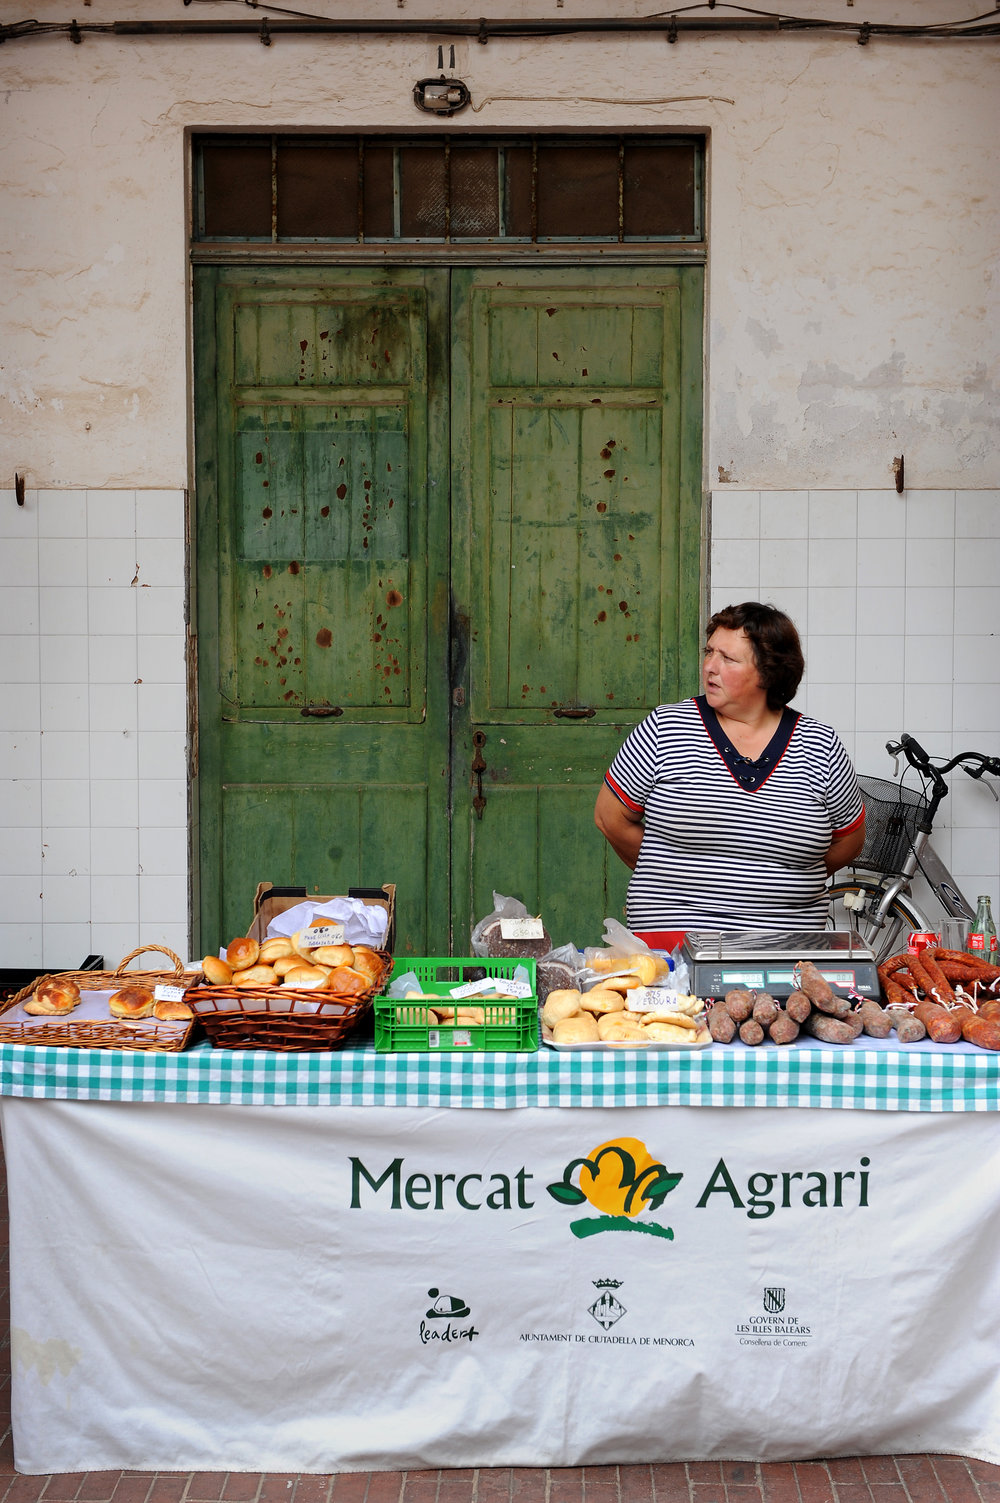 Menorca, shoppailu